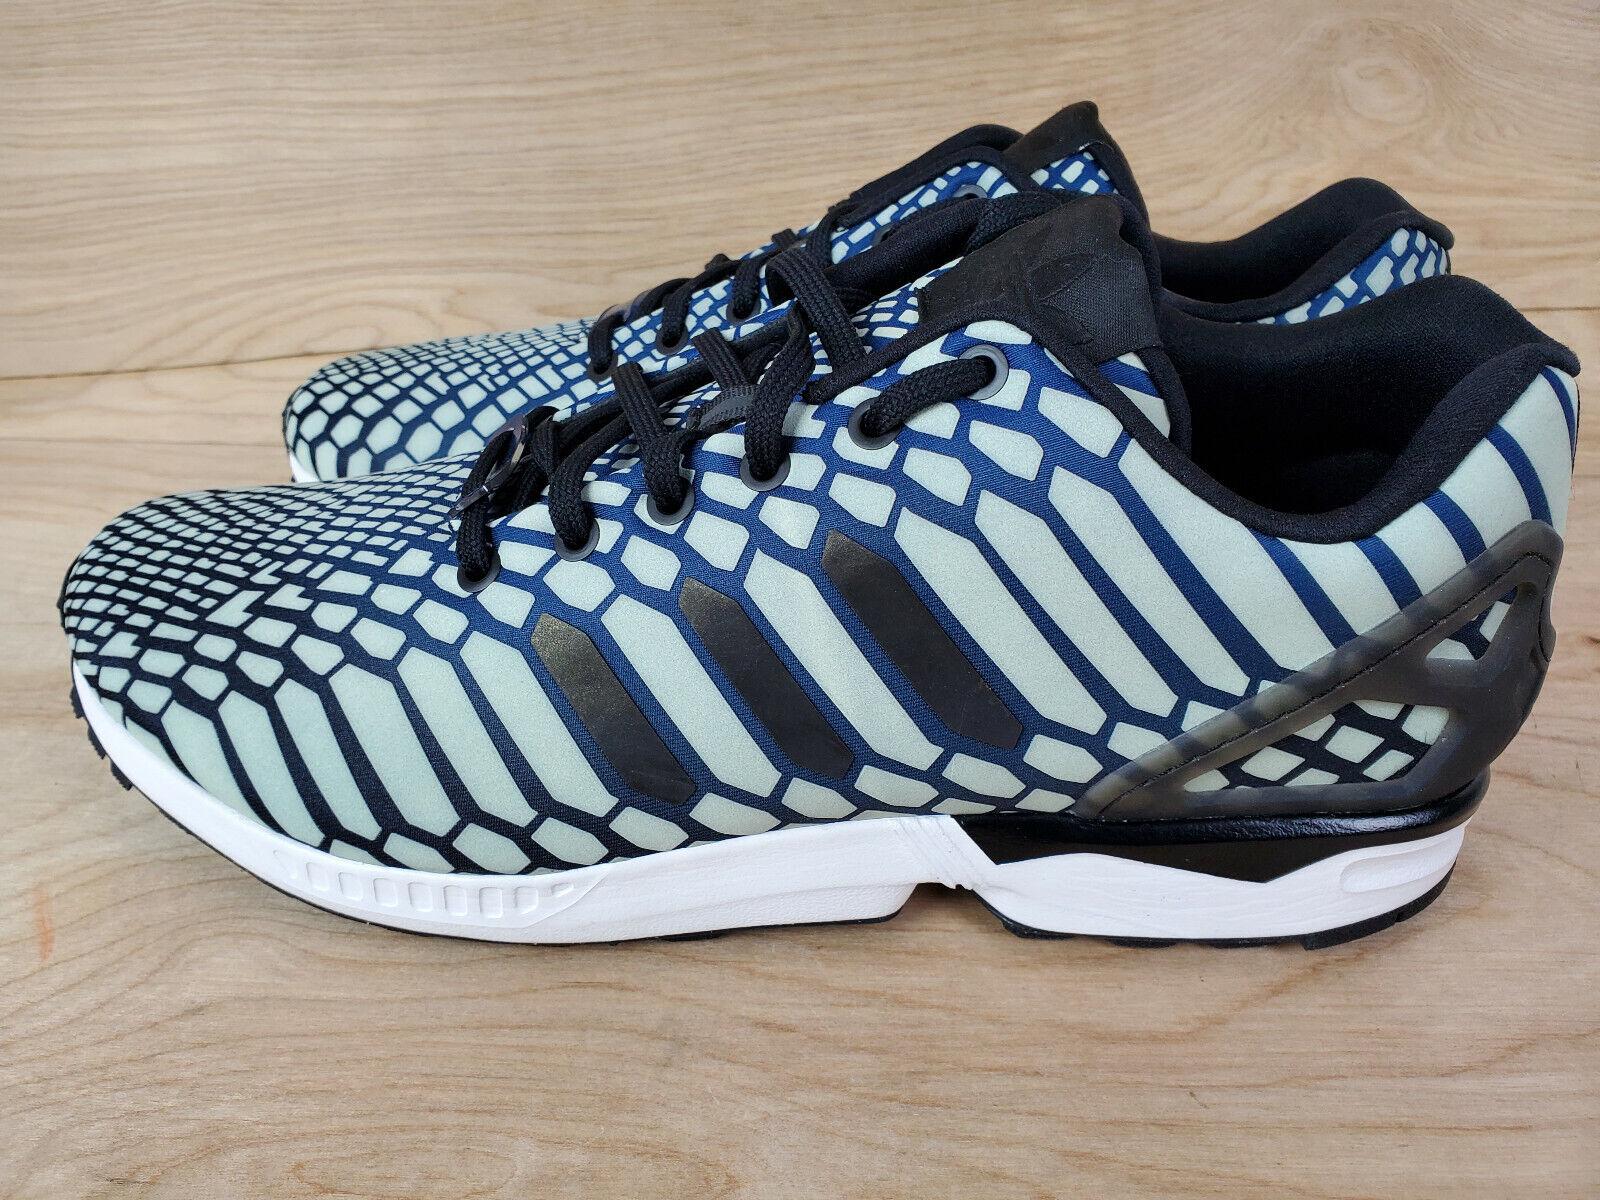 Adidas ZX Flux Xeno GLOW Hi-Viz New Mens, Size 10 Reflective Shoes ART AQ4534